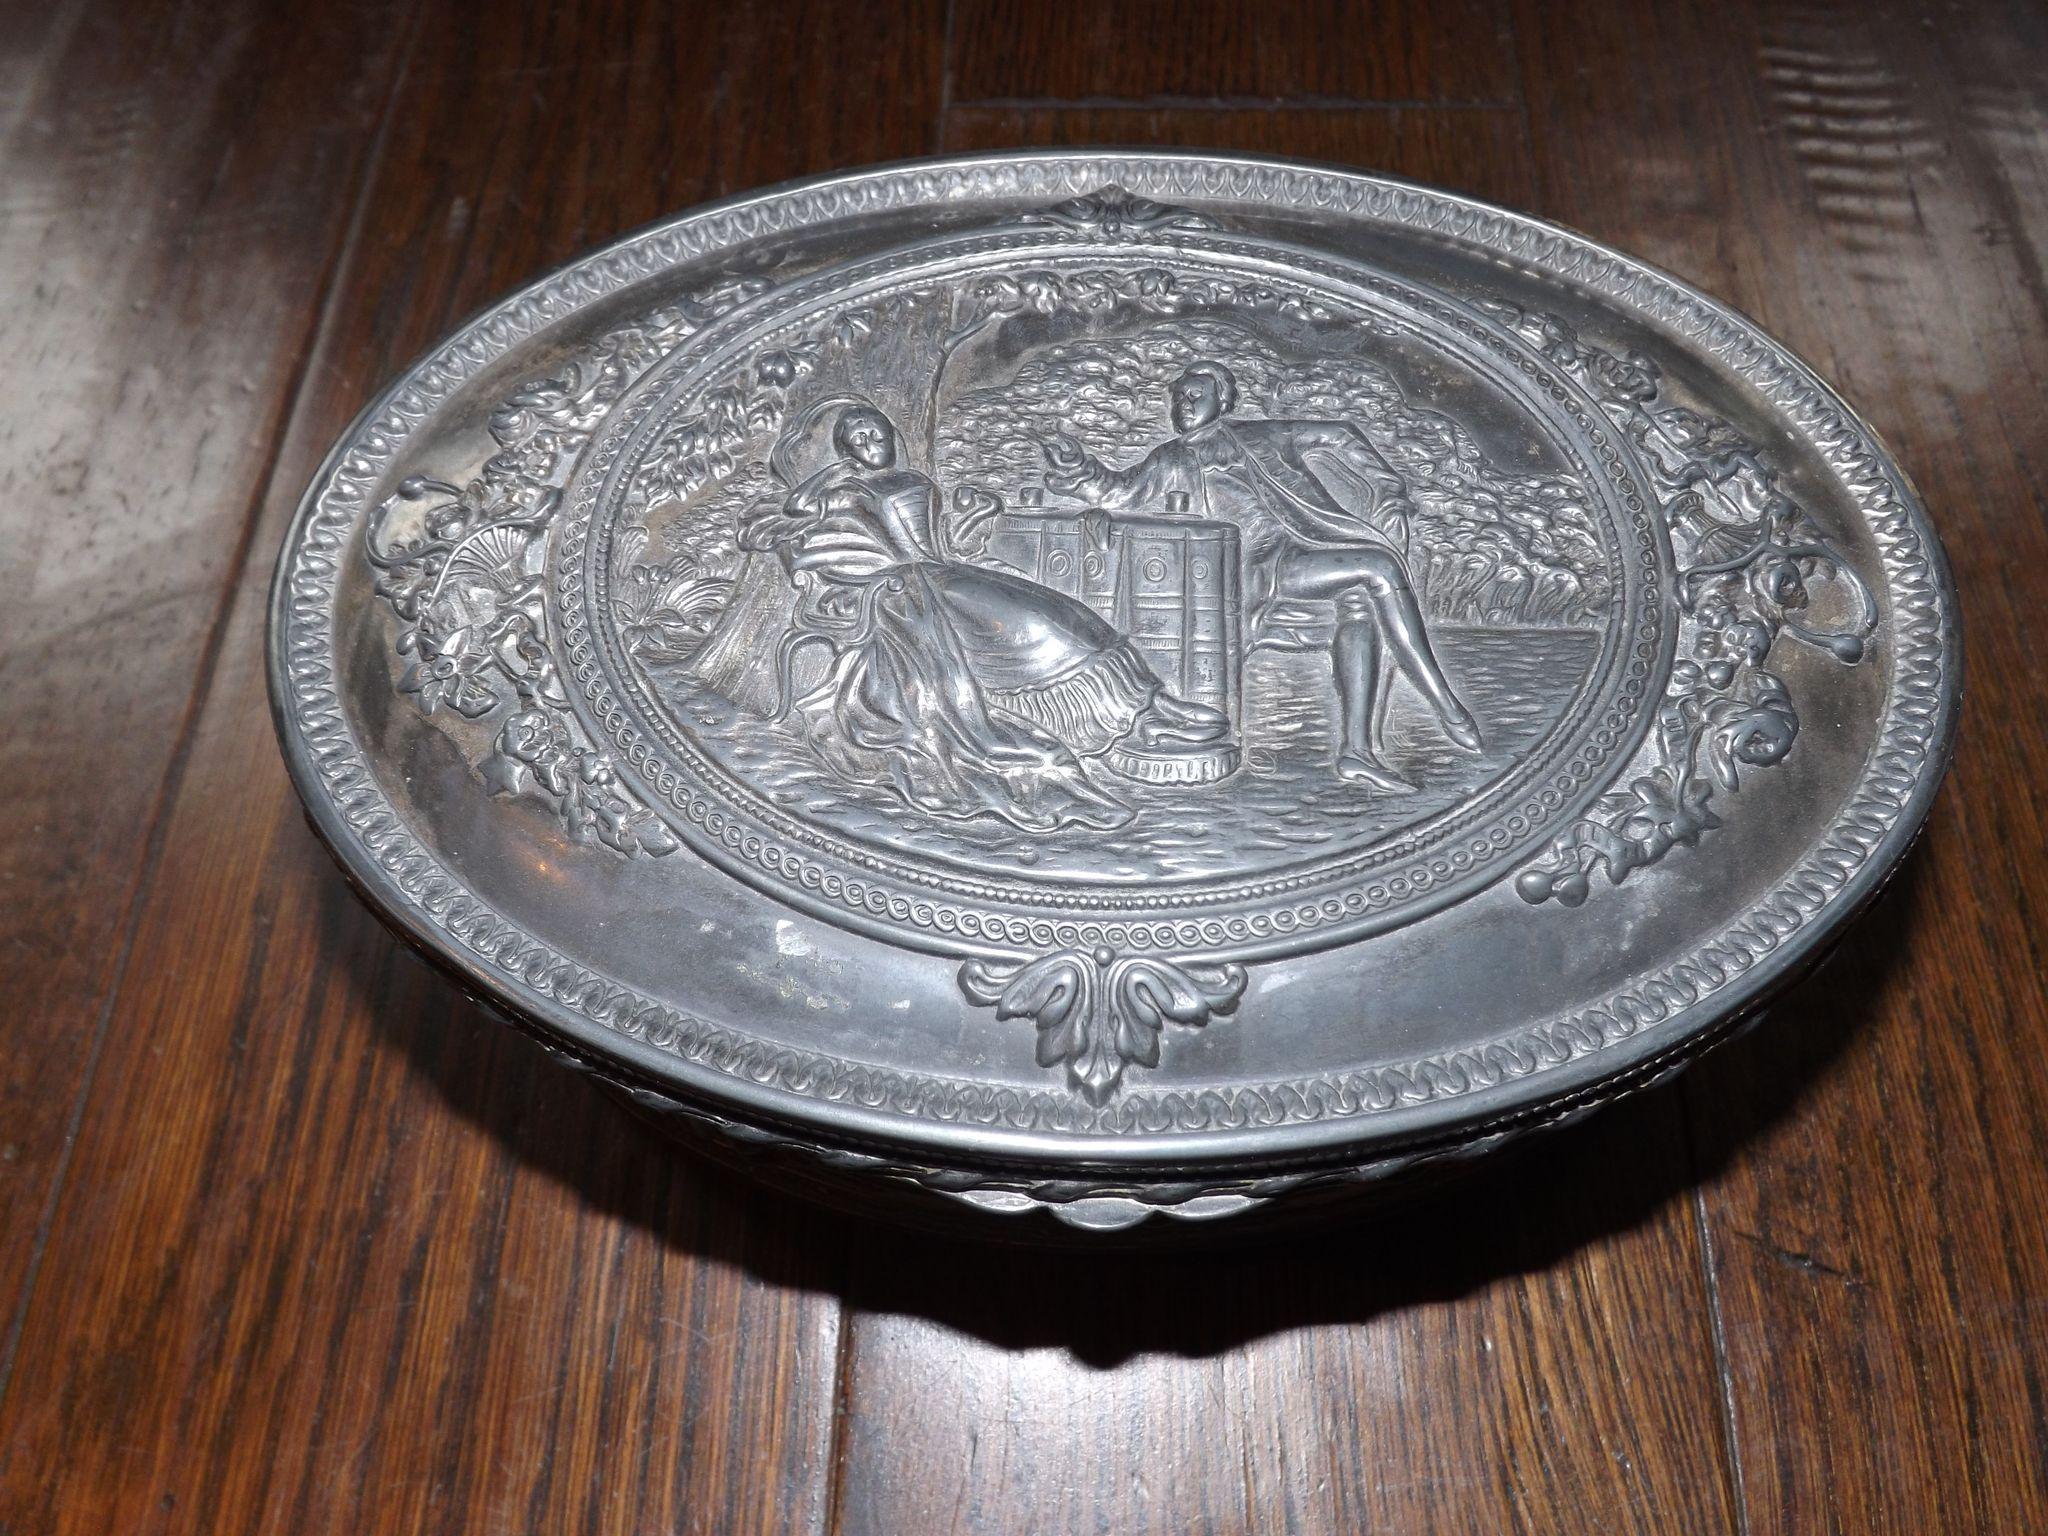 Jennings Brothers Pewter Trinket Jewelry Box 1915